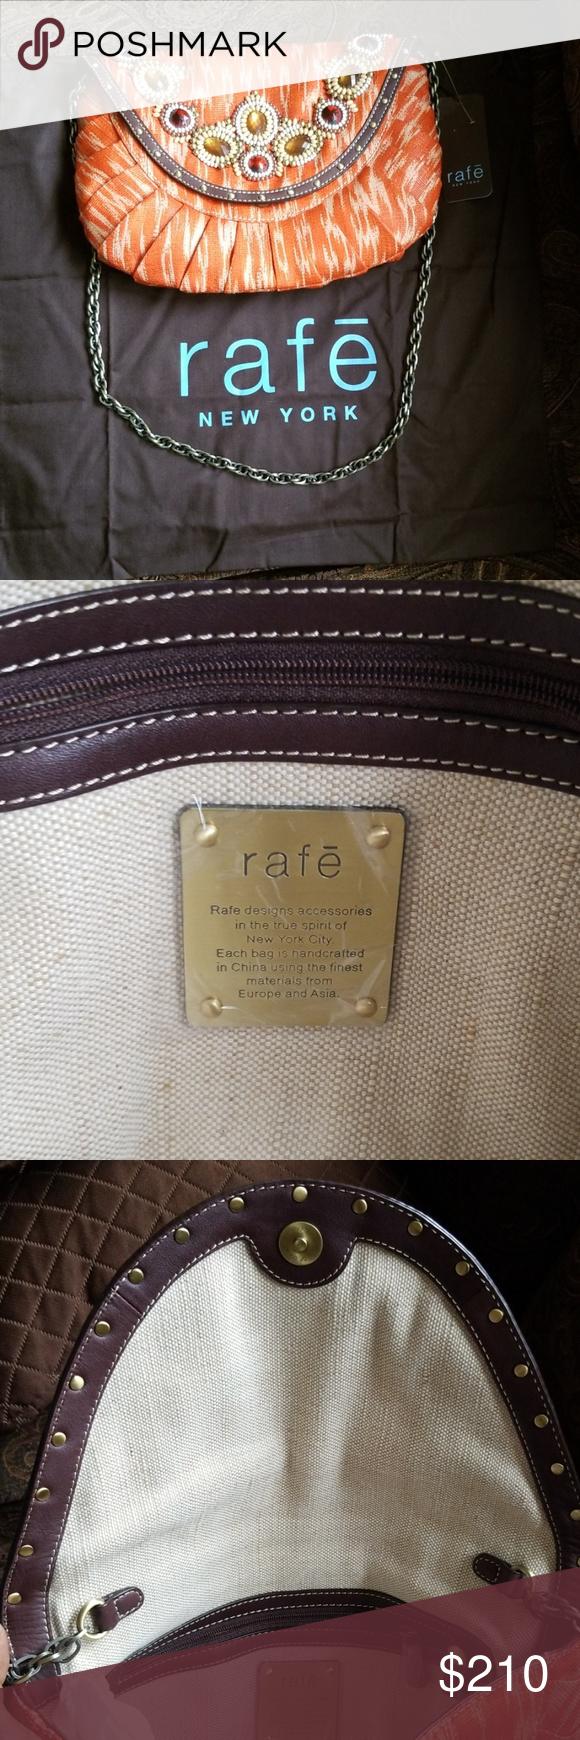 291caf0983 RAFE NEW YORK CROSSBODY BAG Brand new RAFE crossbody bag Rafe Bags Shoulder  Bags